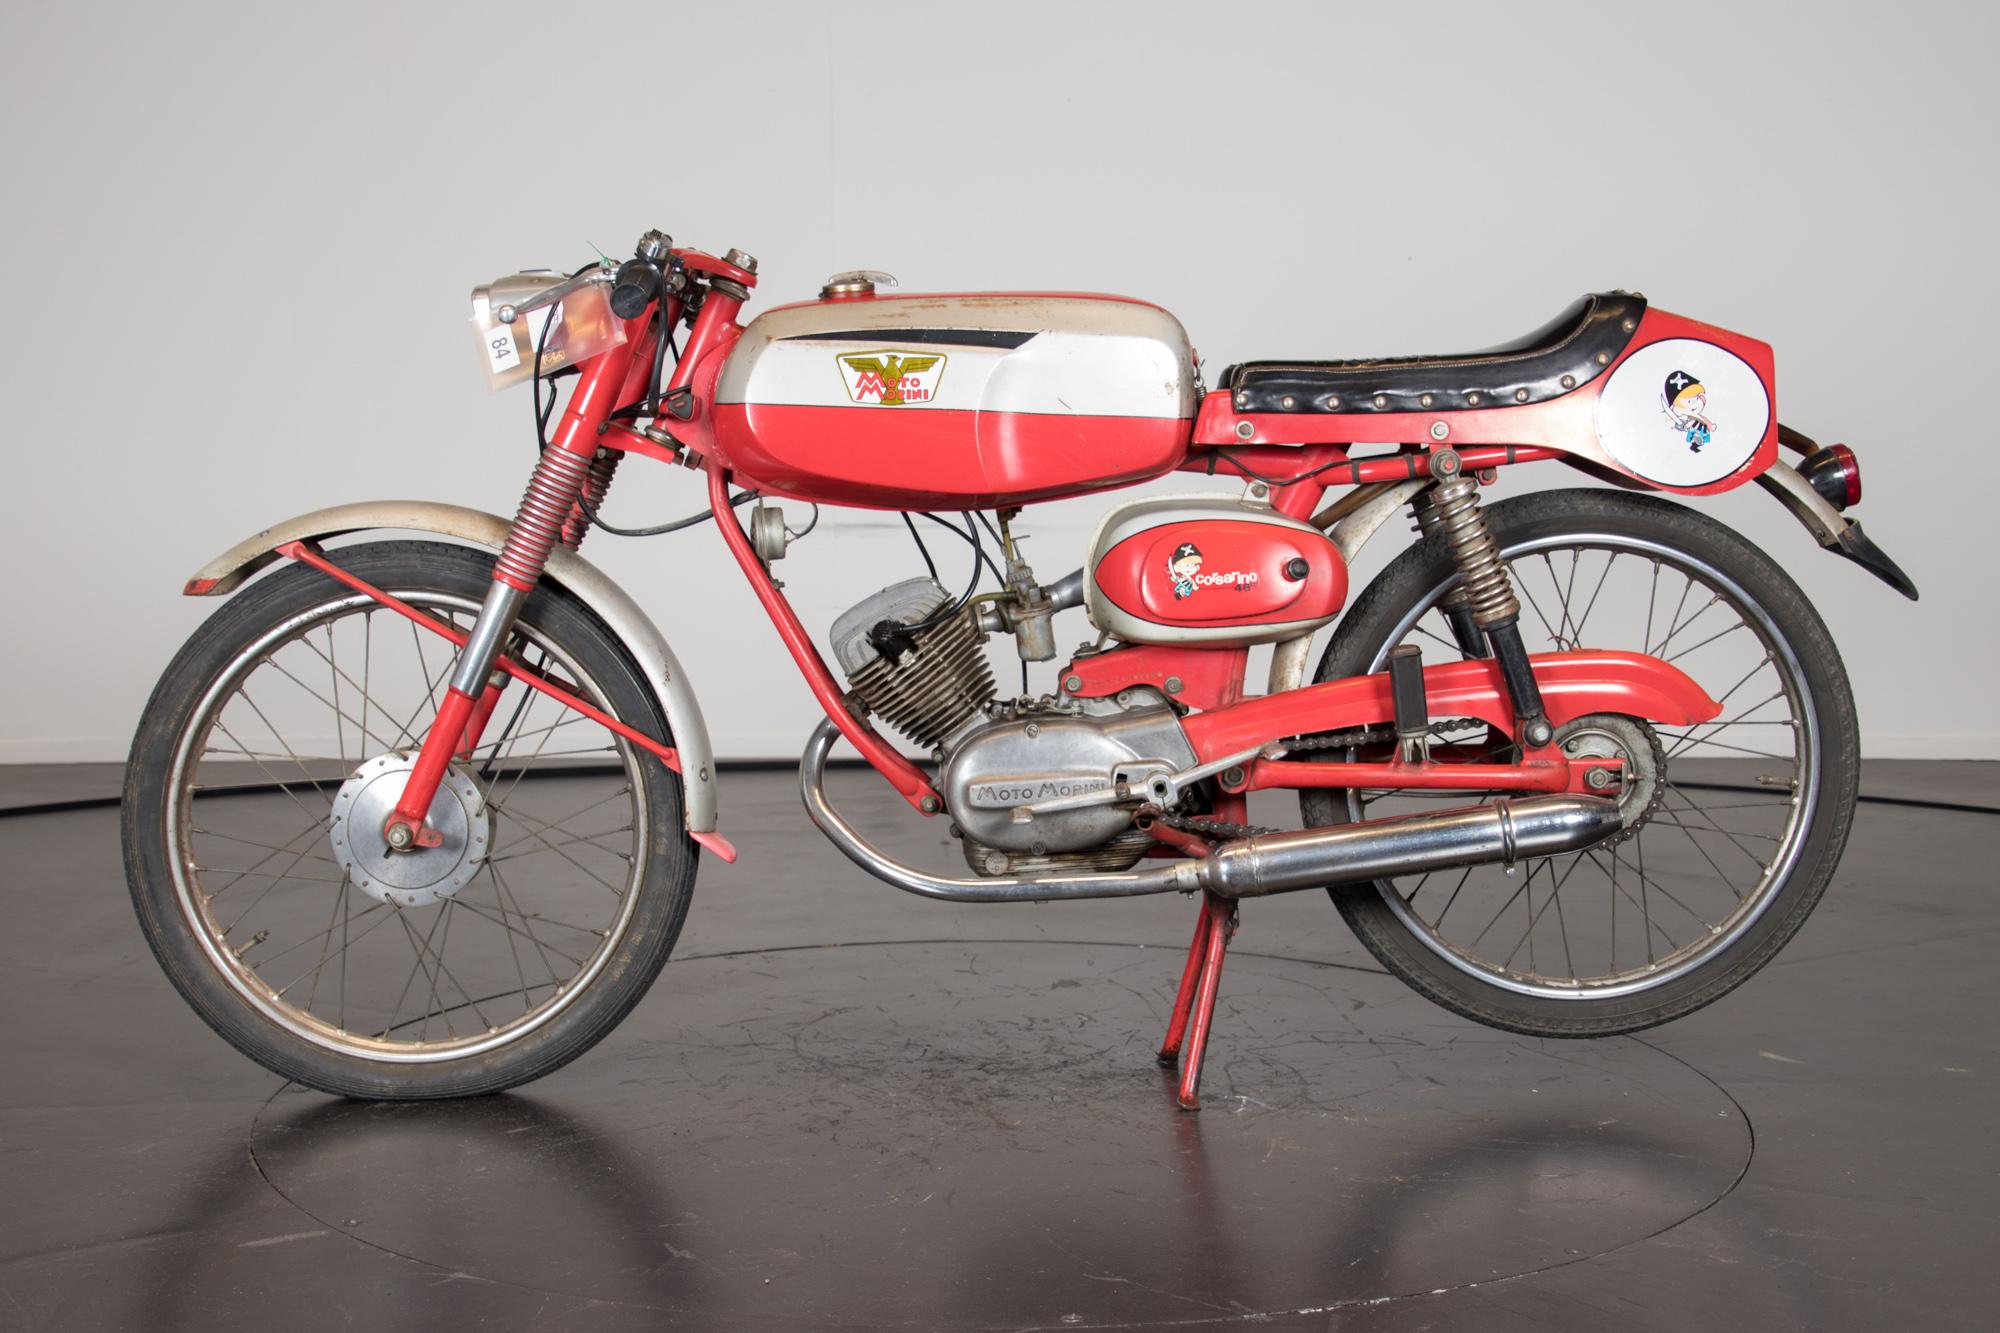 1966 Moto Morini Corsarino 50 Zz Moto Morini Moto D